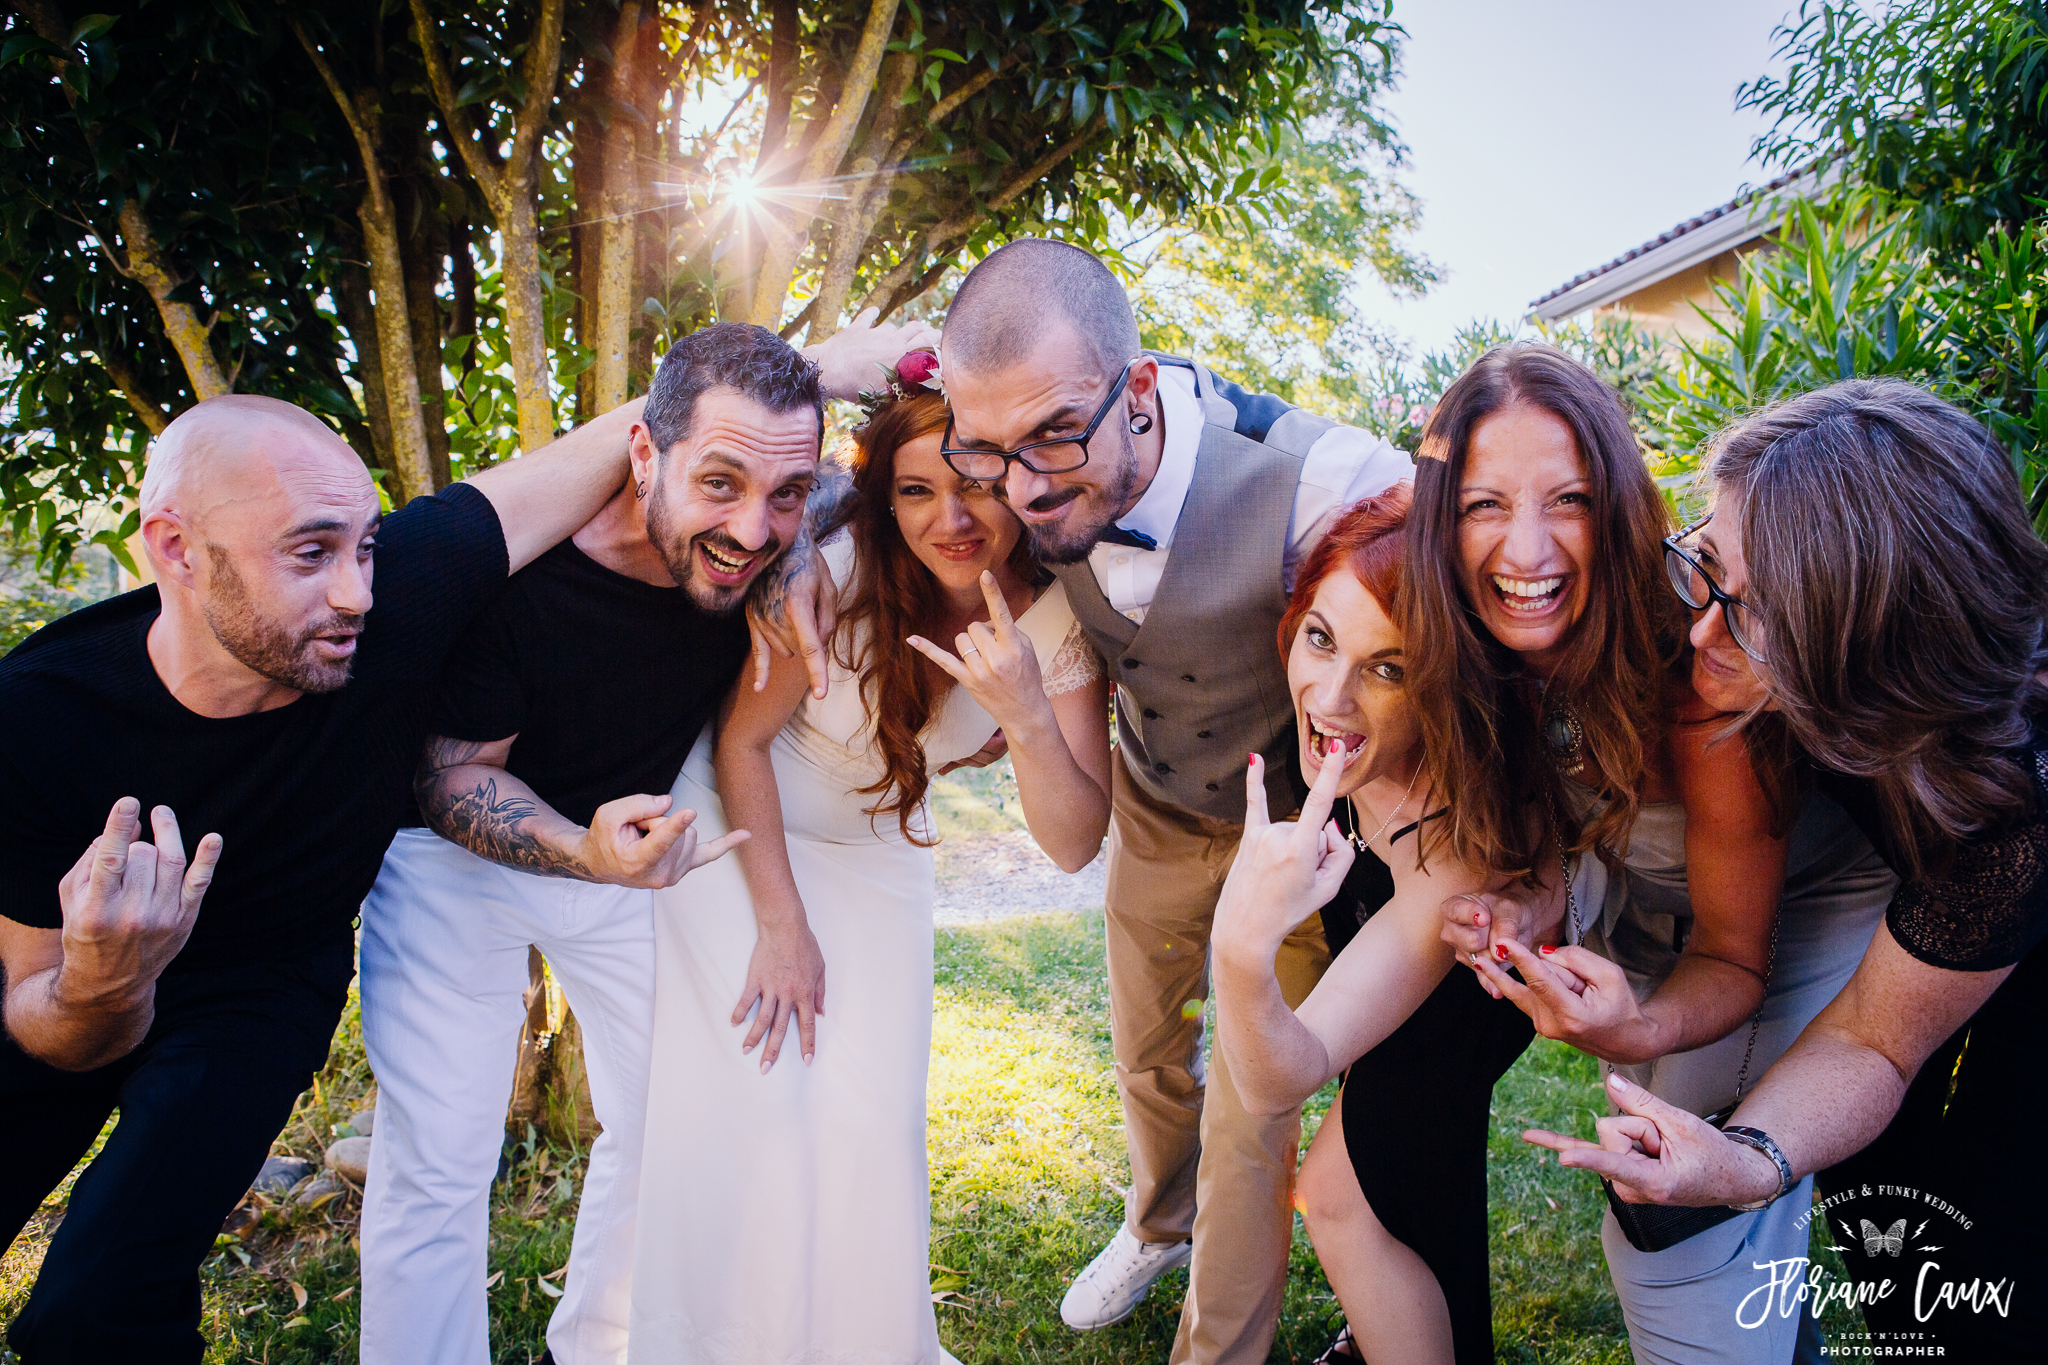 photographe-mariage-toulouse-rocknroll-maries-tatoues-floriane-caux-105